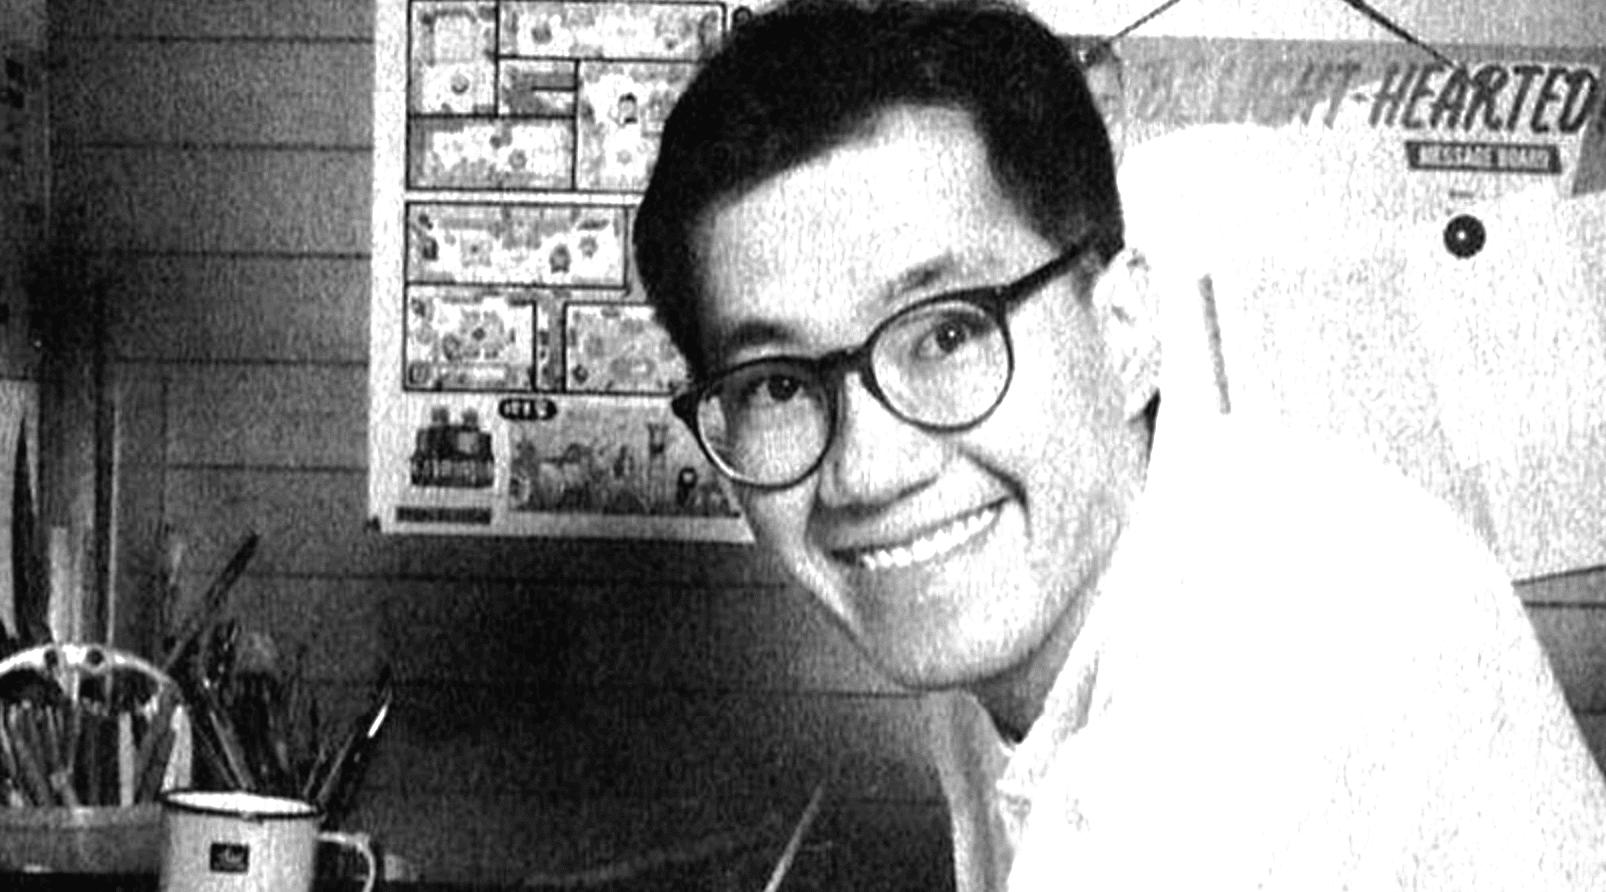 portrait of Akira Toriyama